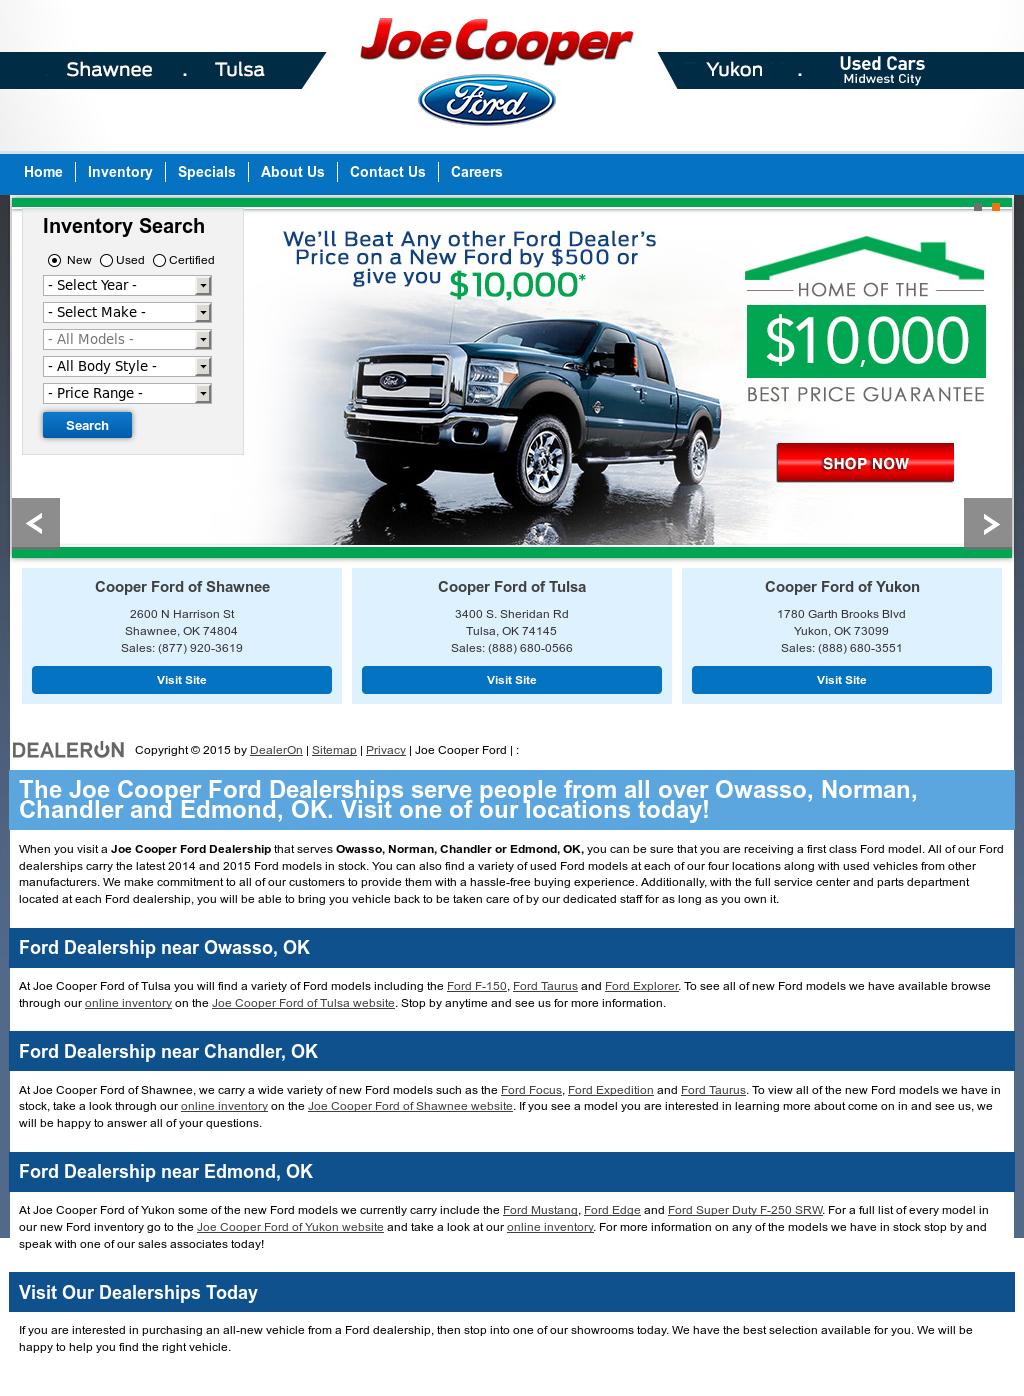 Joe Cooper Ford Shawnee >> Joe Cooper Competitors Revenue And Employees Owler